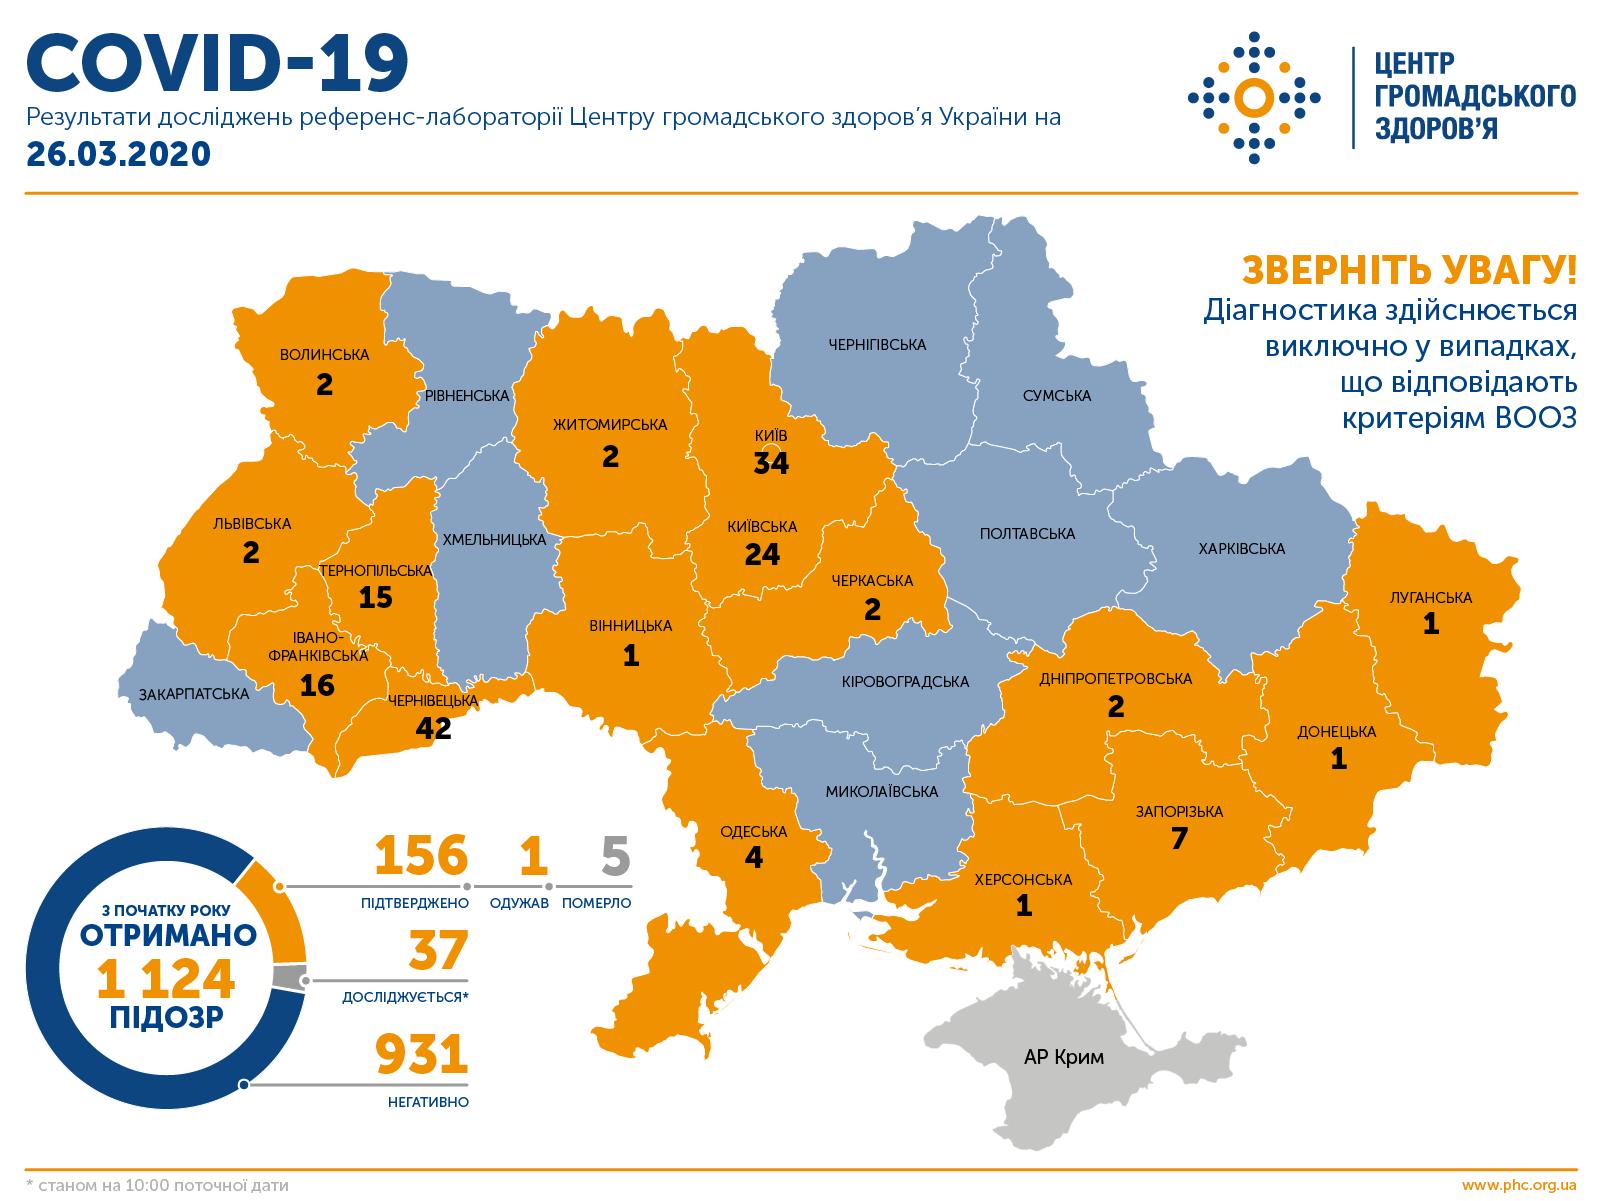 Коронавирус в Украине. Инфографика